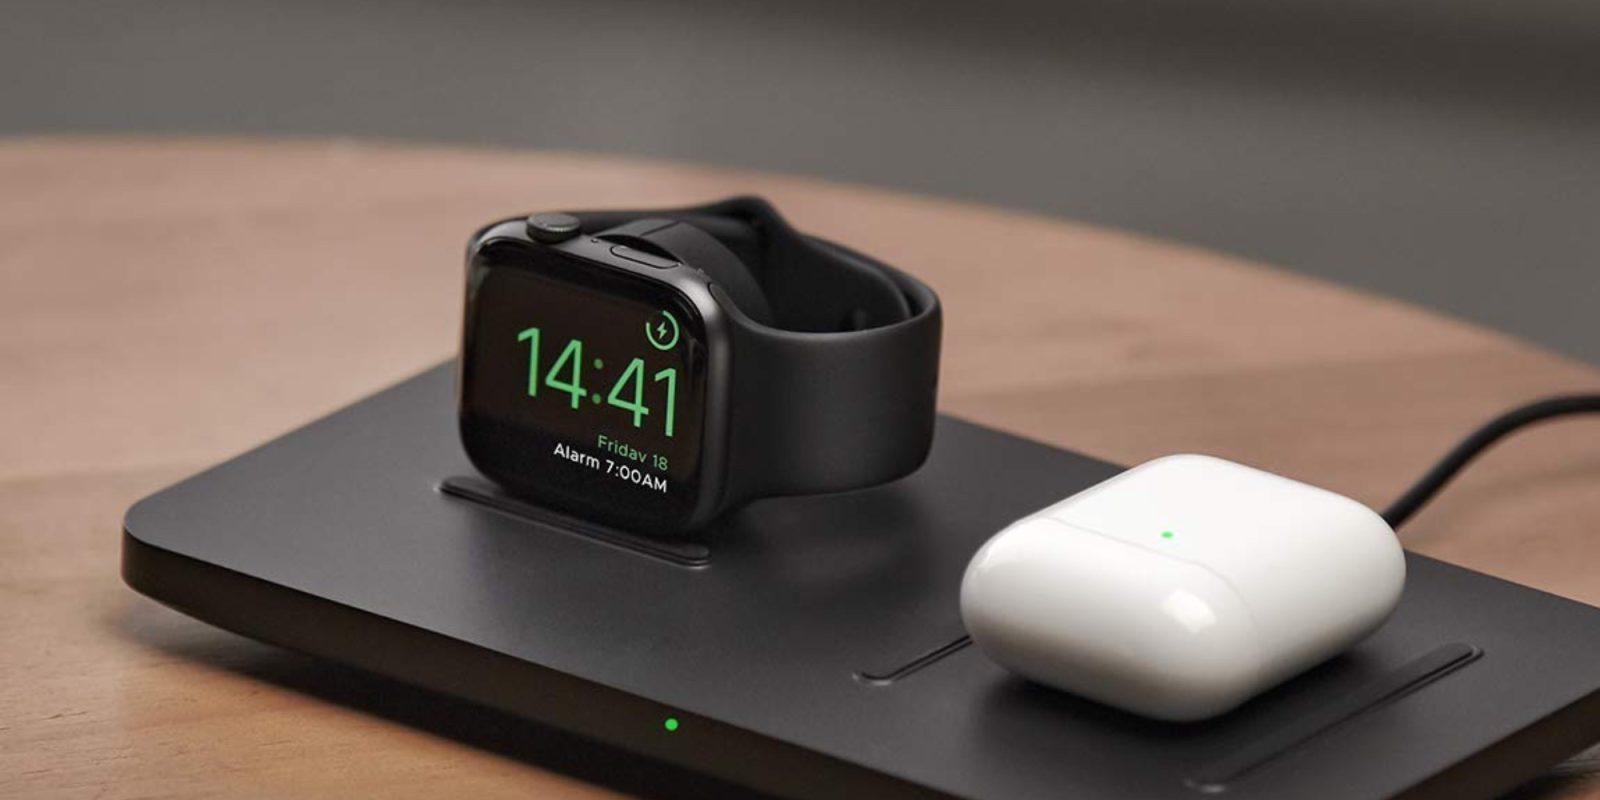 Smartphone Accessories: Seneo 10W 2-in-1 Qi Charging Pad $20 (32% off), more